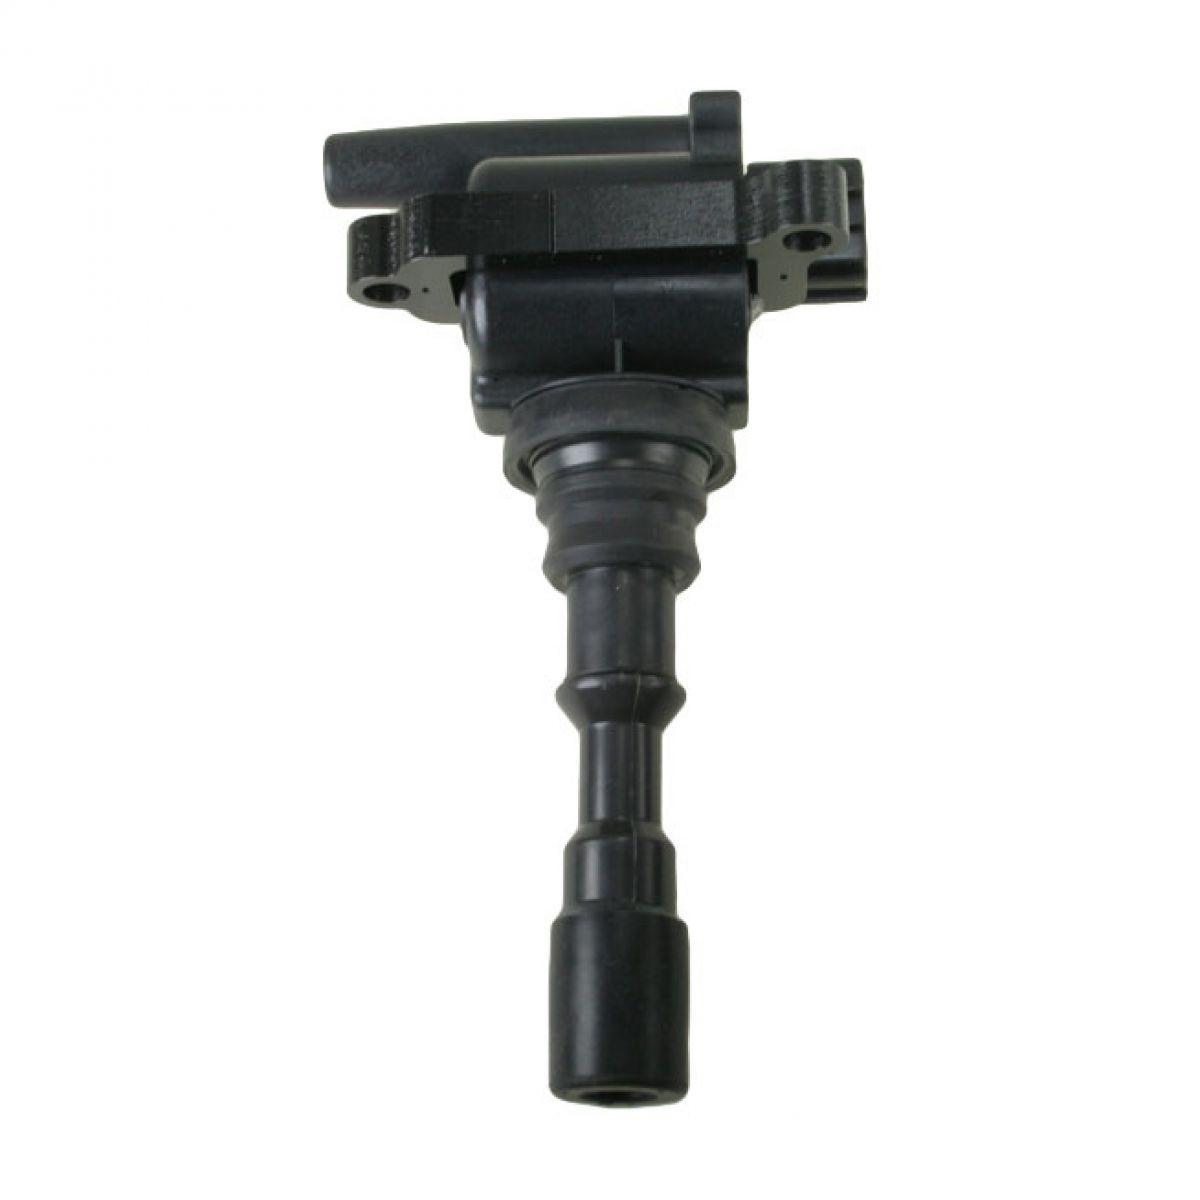 Ignition Coil Order: Ignition Coil 3.5L V6 For 03-06 Kia Sorento